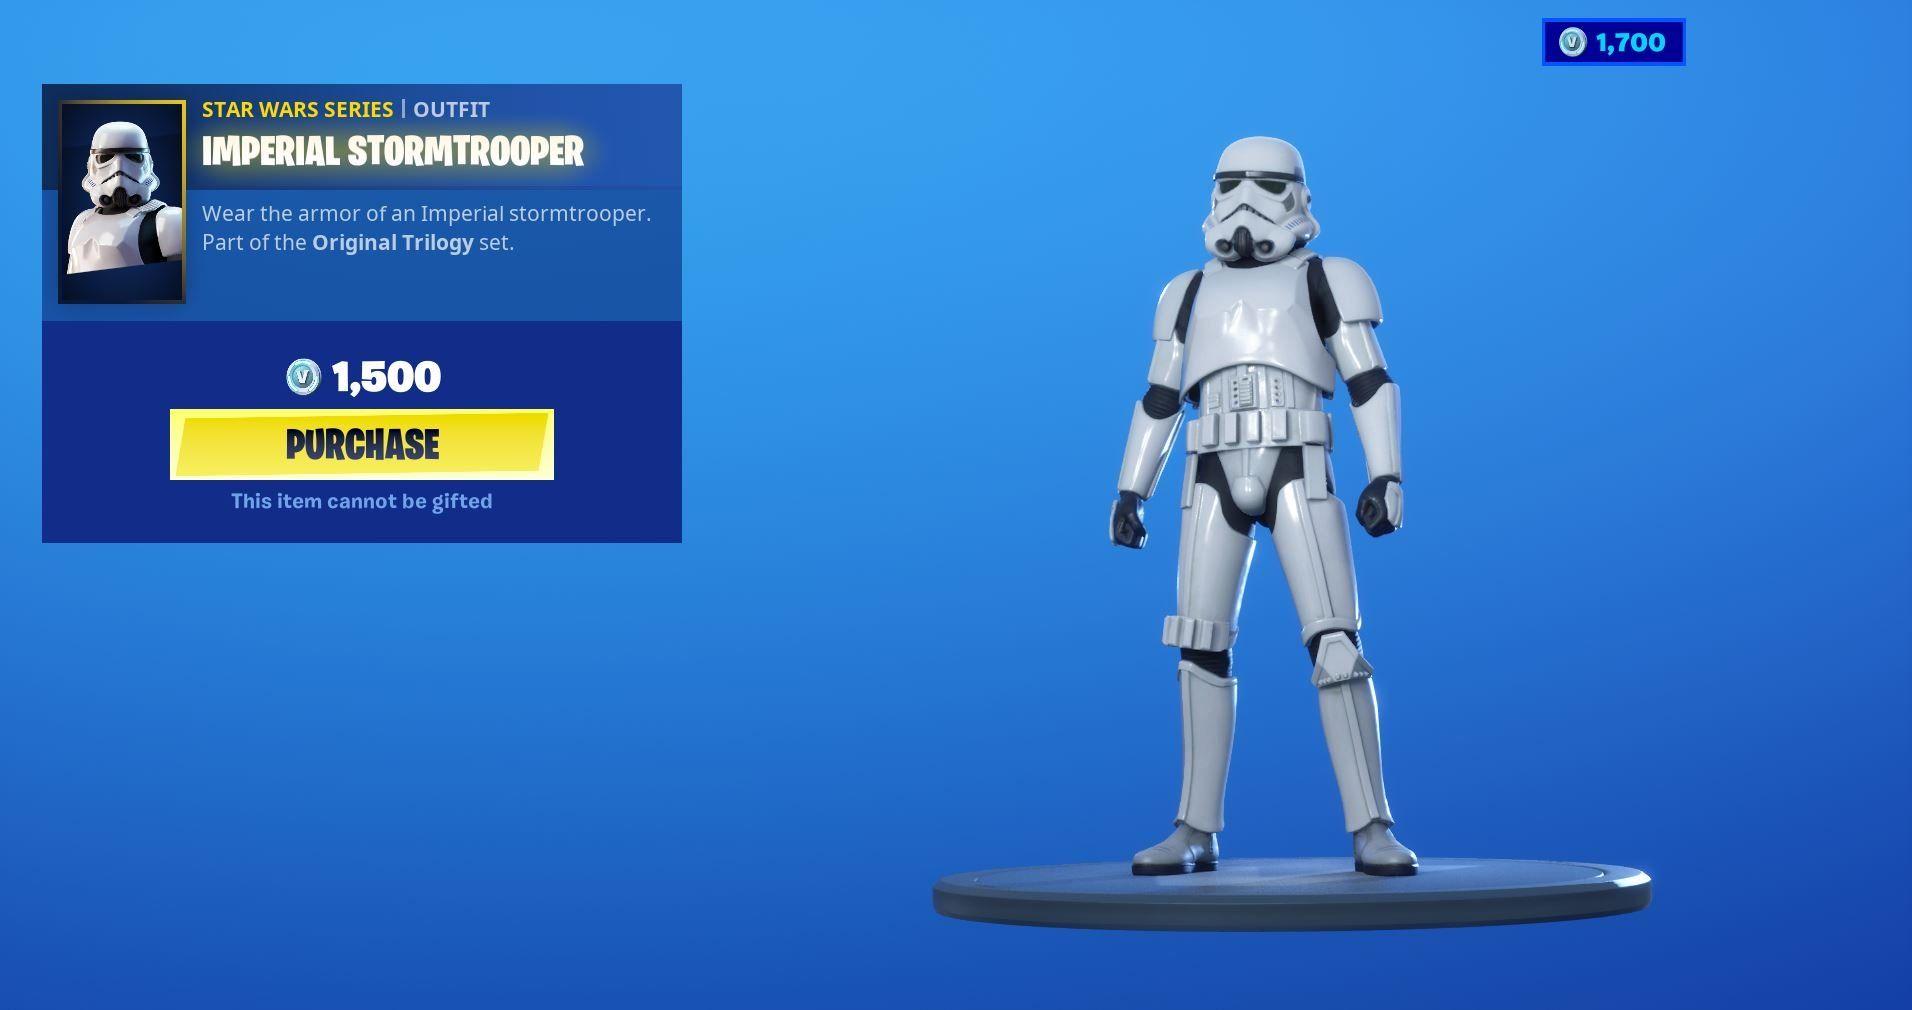 Fortnite X Star Wars Collaboration Imperial Stormtrooper Item Shop Skin And Star Destroyer Approaching Epic Game Imperial Stormtrooper Stormtrooper Star Wars